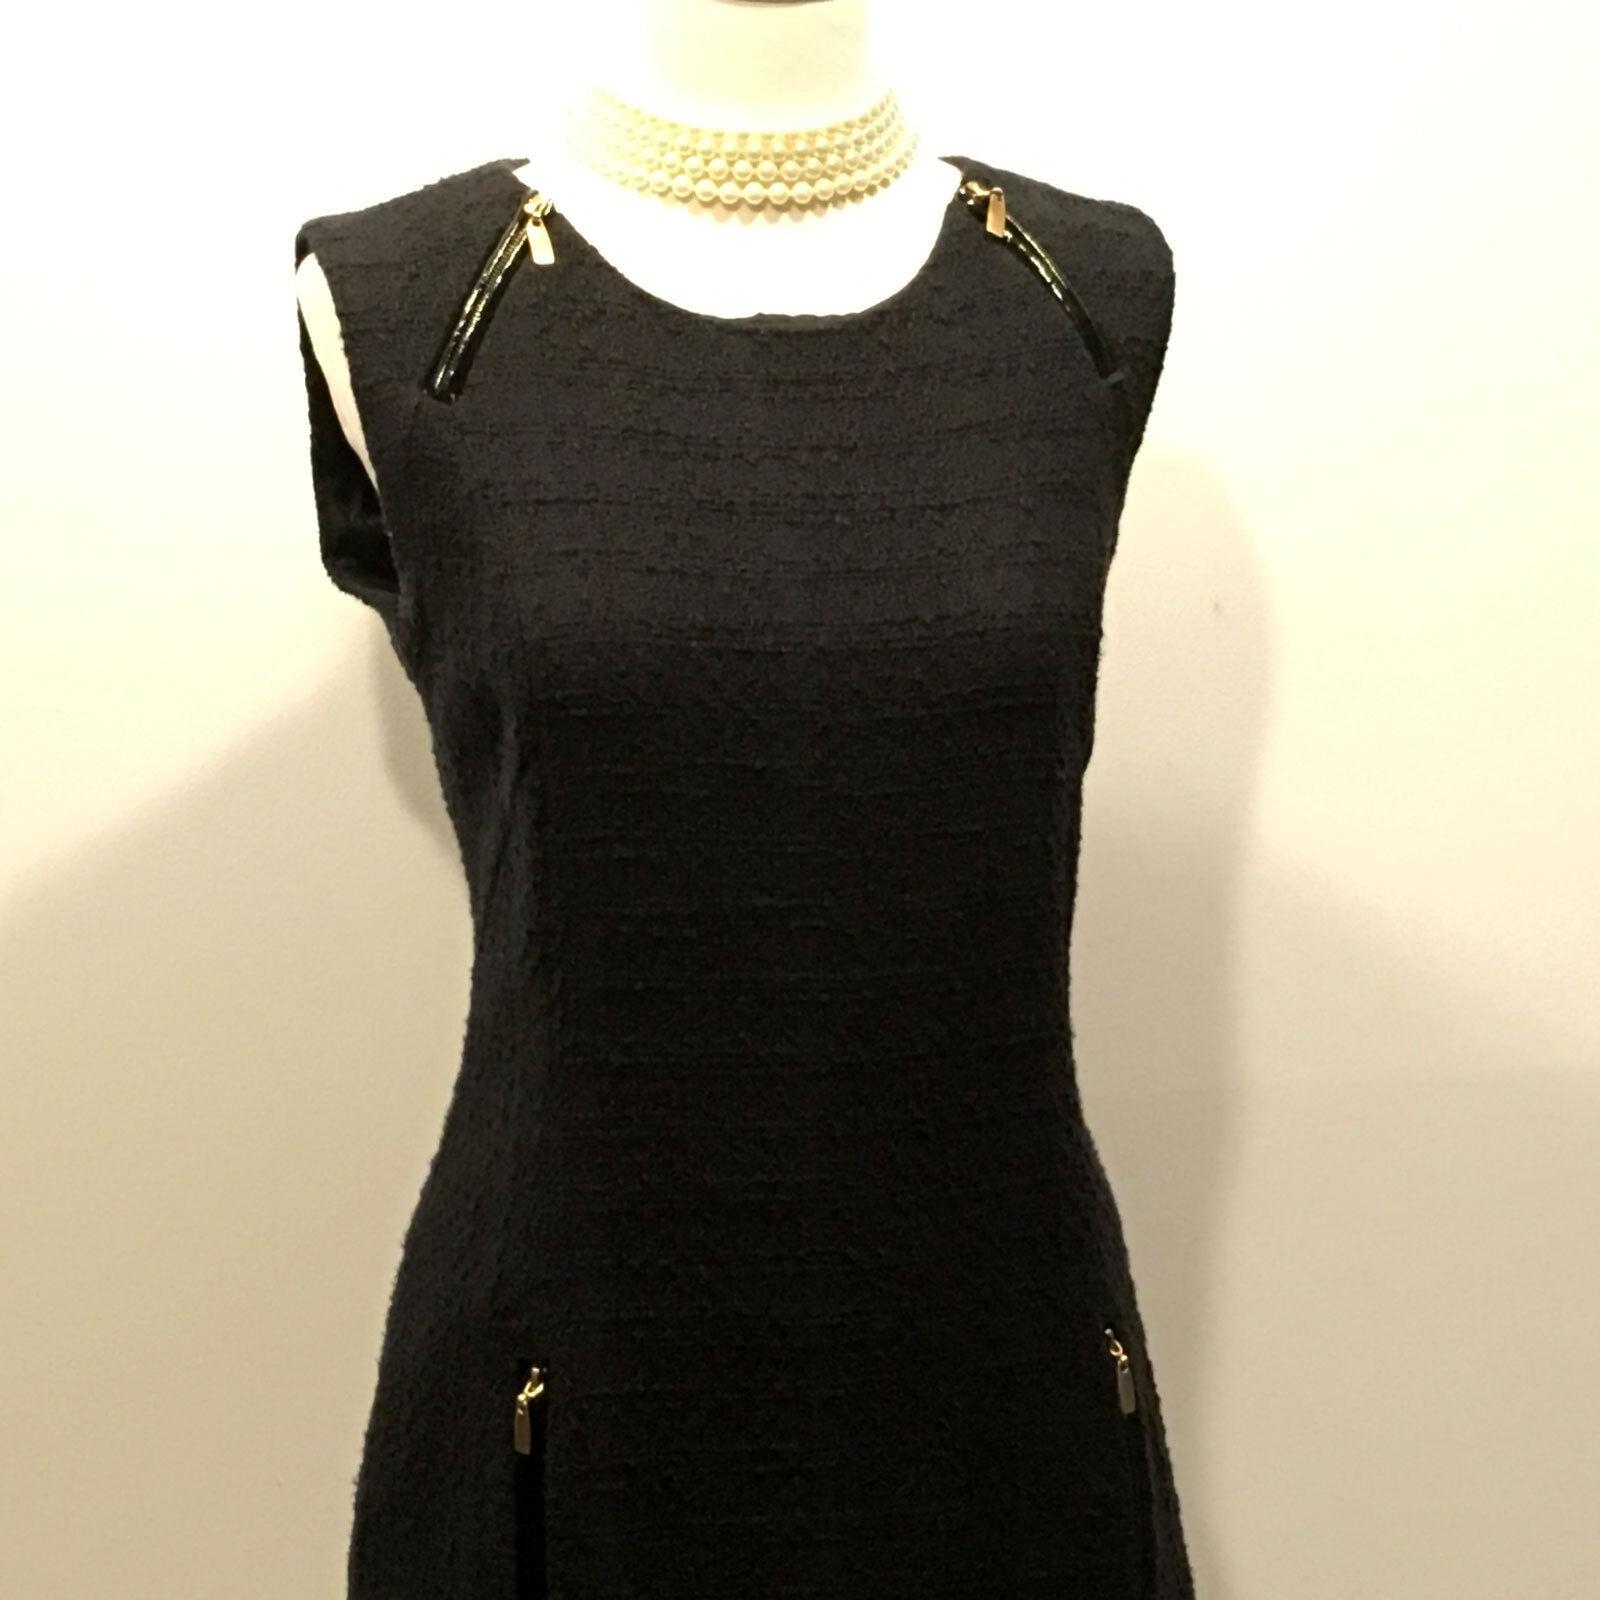 4ab89a9e52b ... Laundry by Shelli Shelli Shelli Segal Patent Leather Trimmed Boucle  Sheath Dress - Size 06 93a25c ...